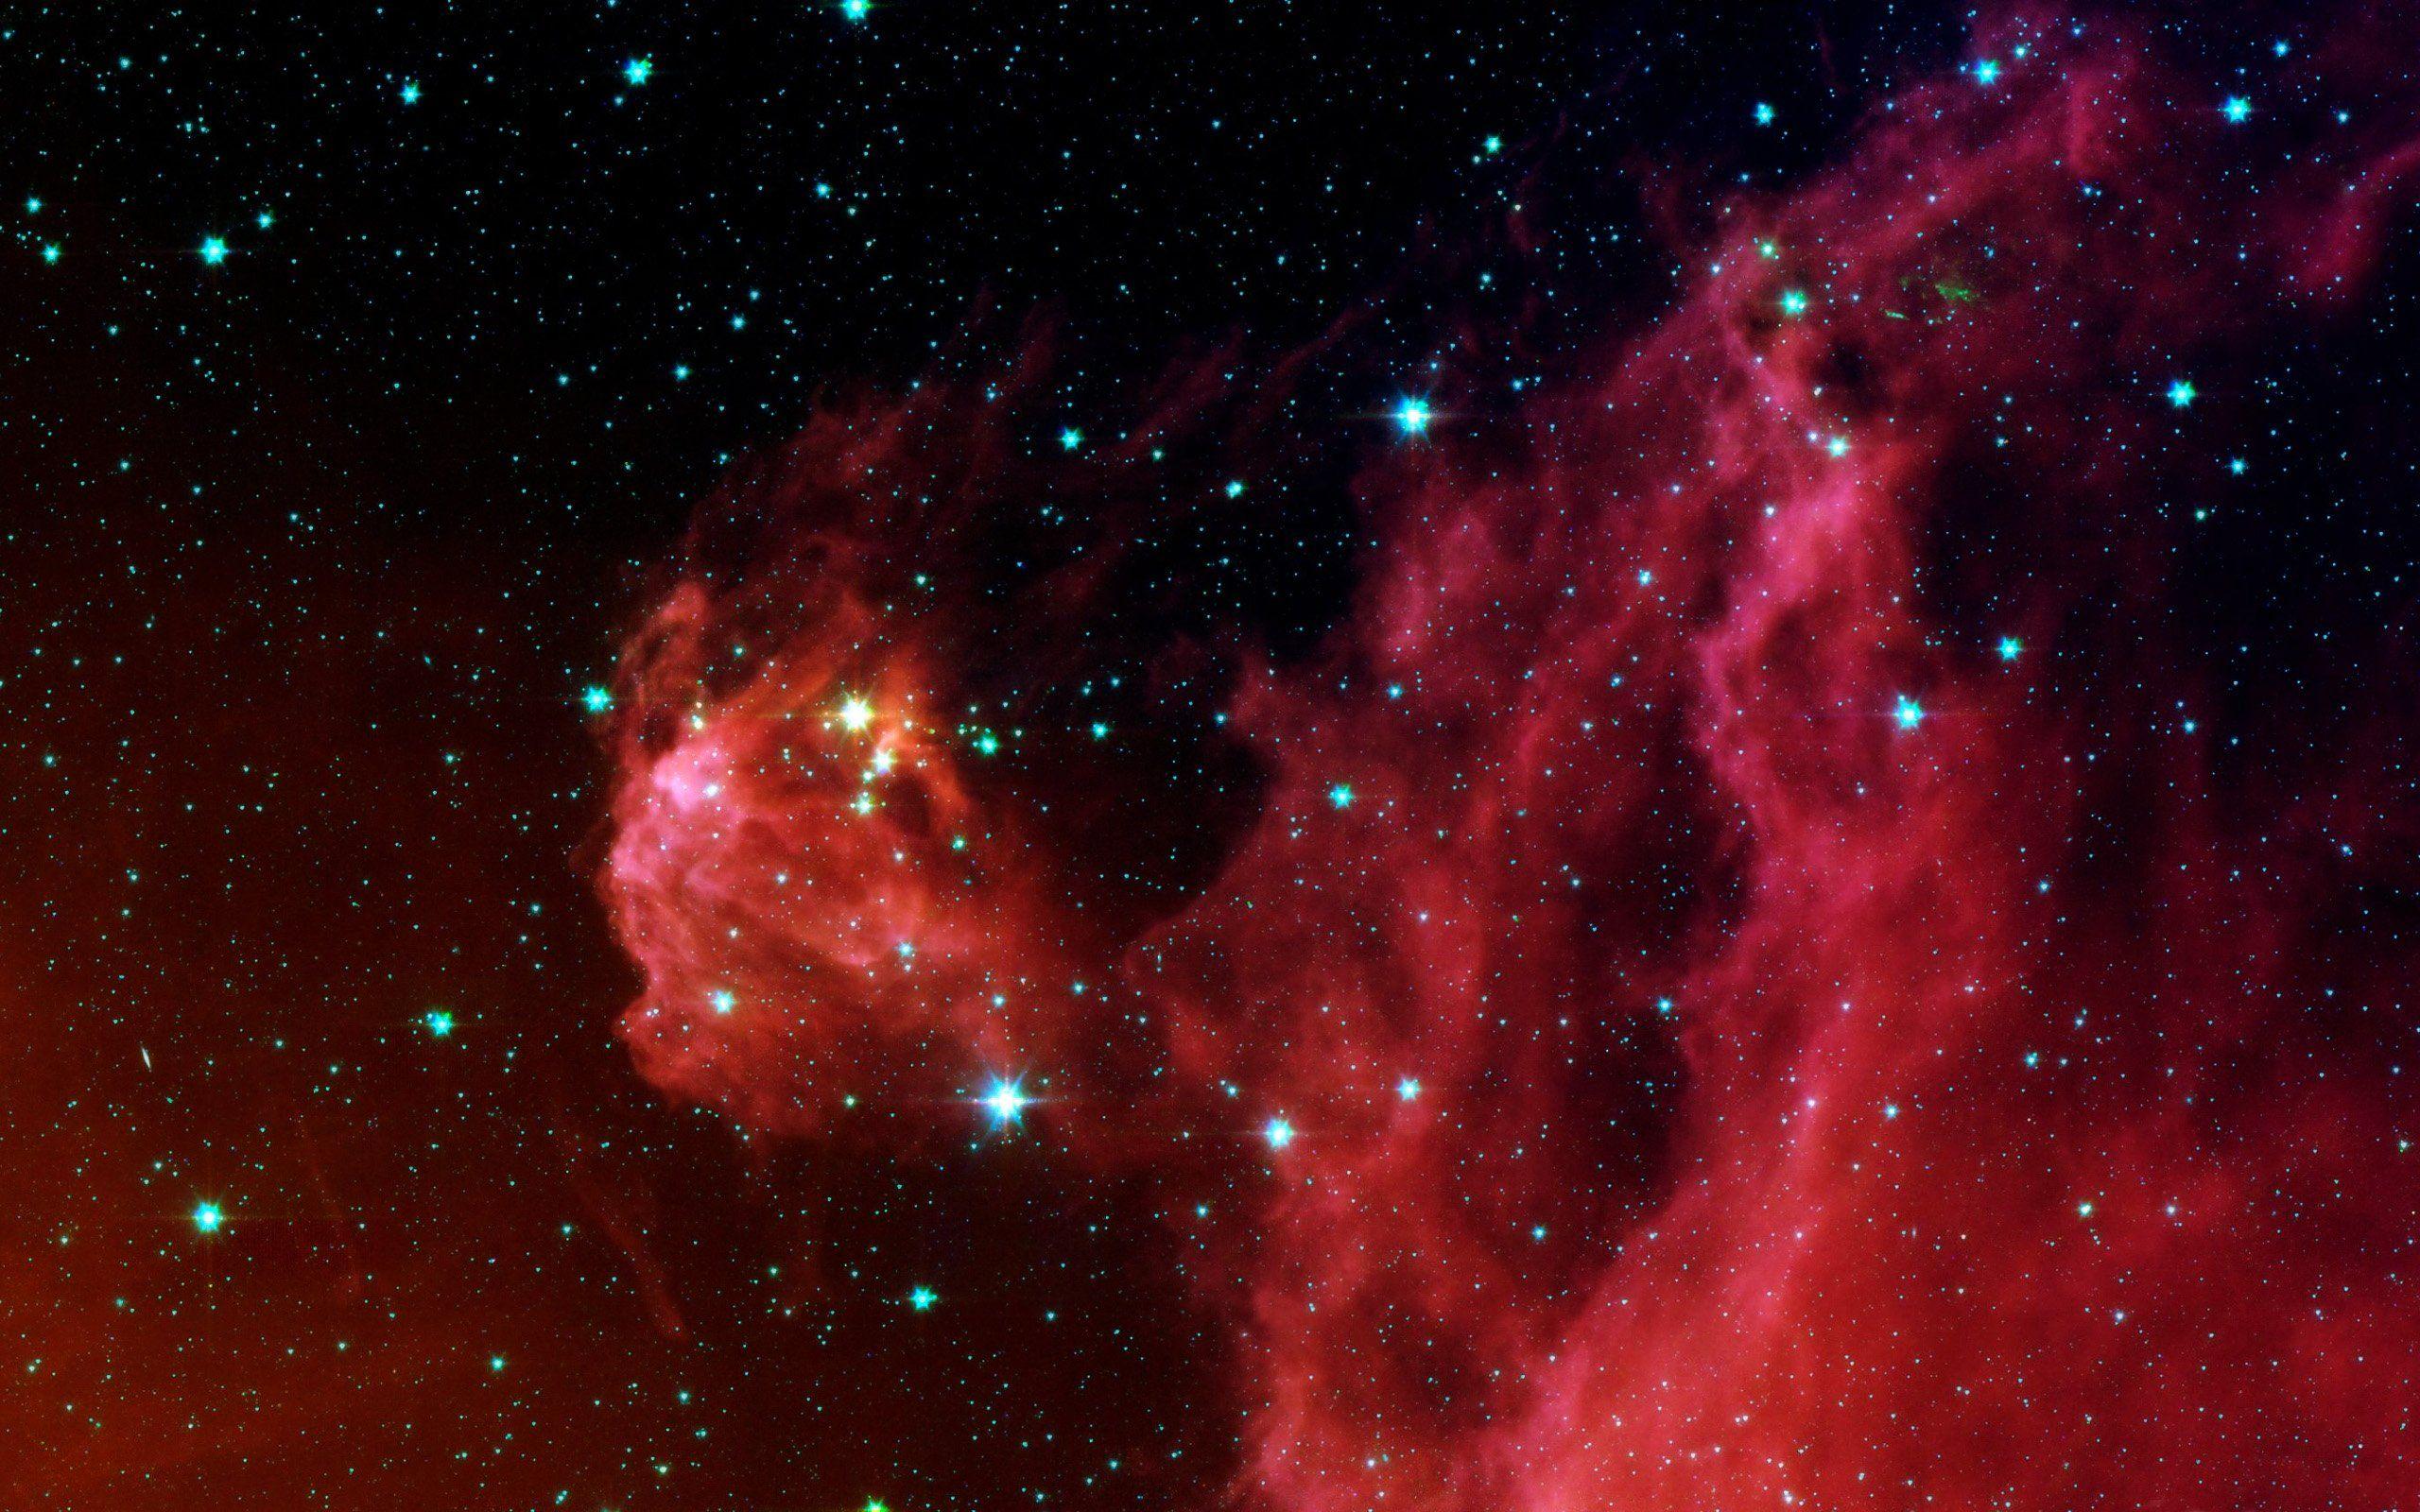 wallpaper-stars-sparkly-galaxy-media 2,560×1,600 pixels